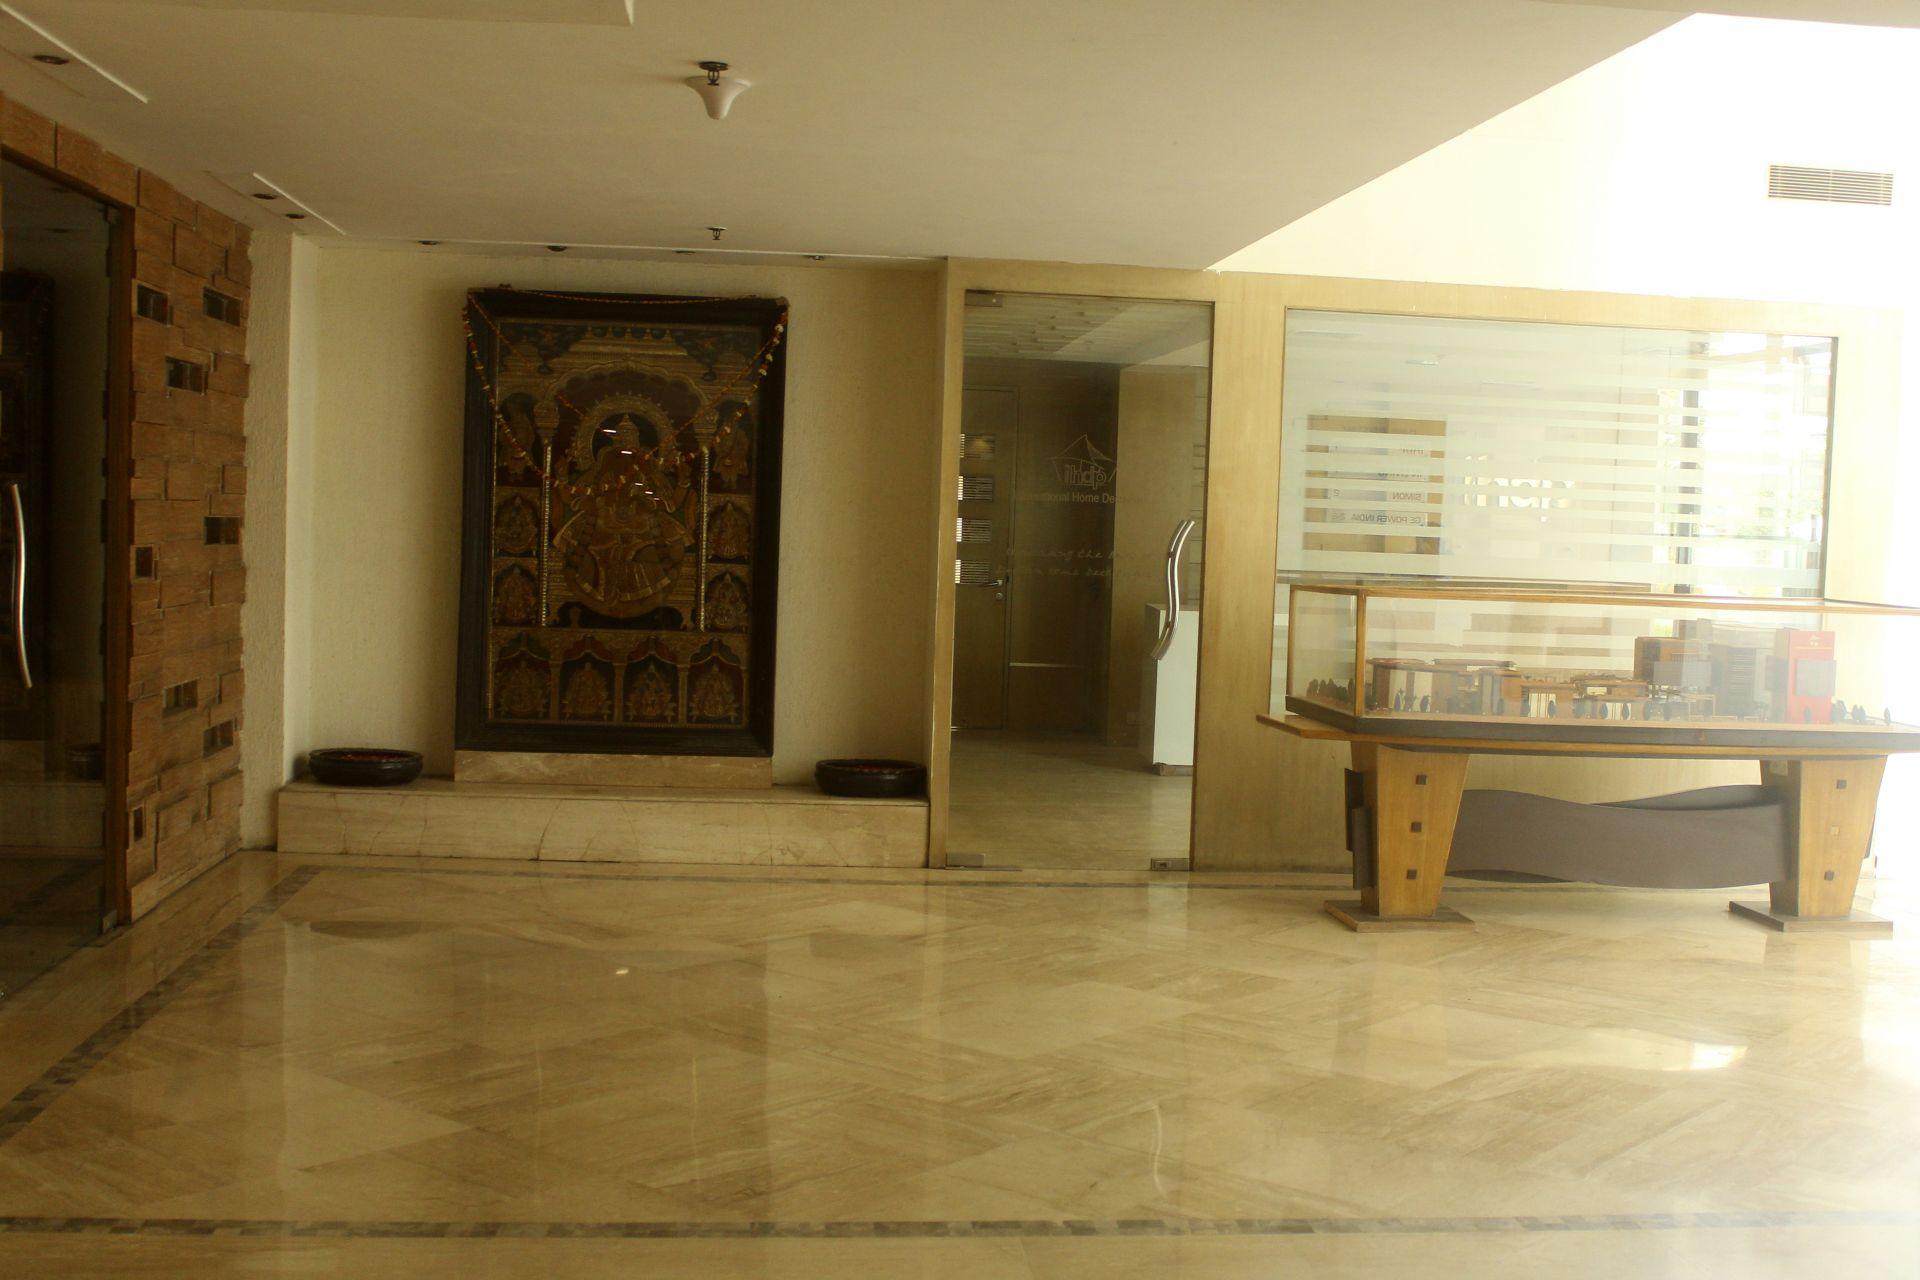 IHDP business park, Noida